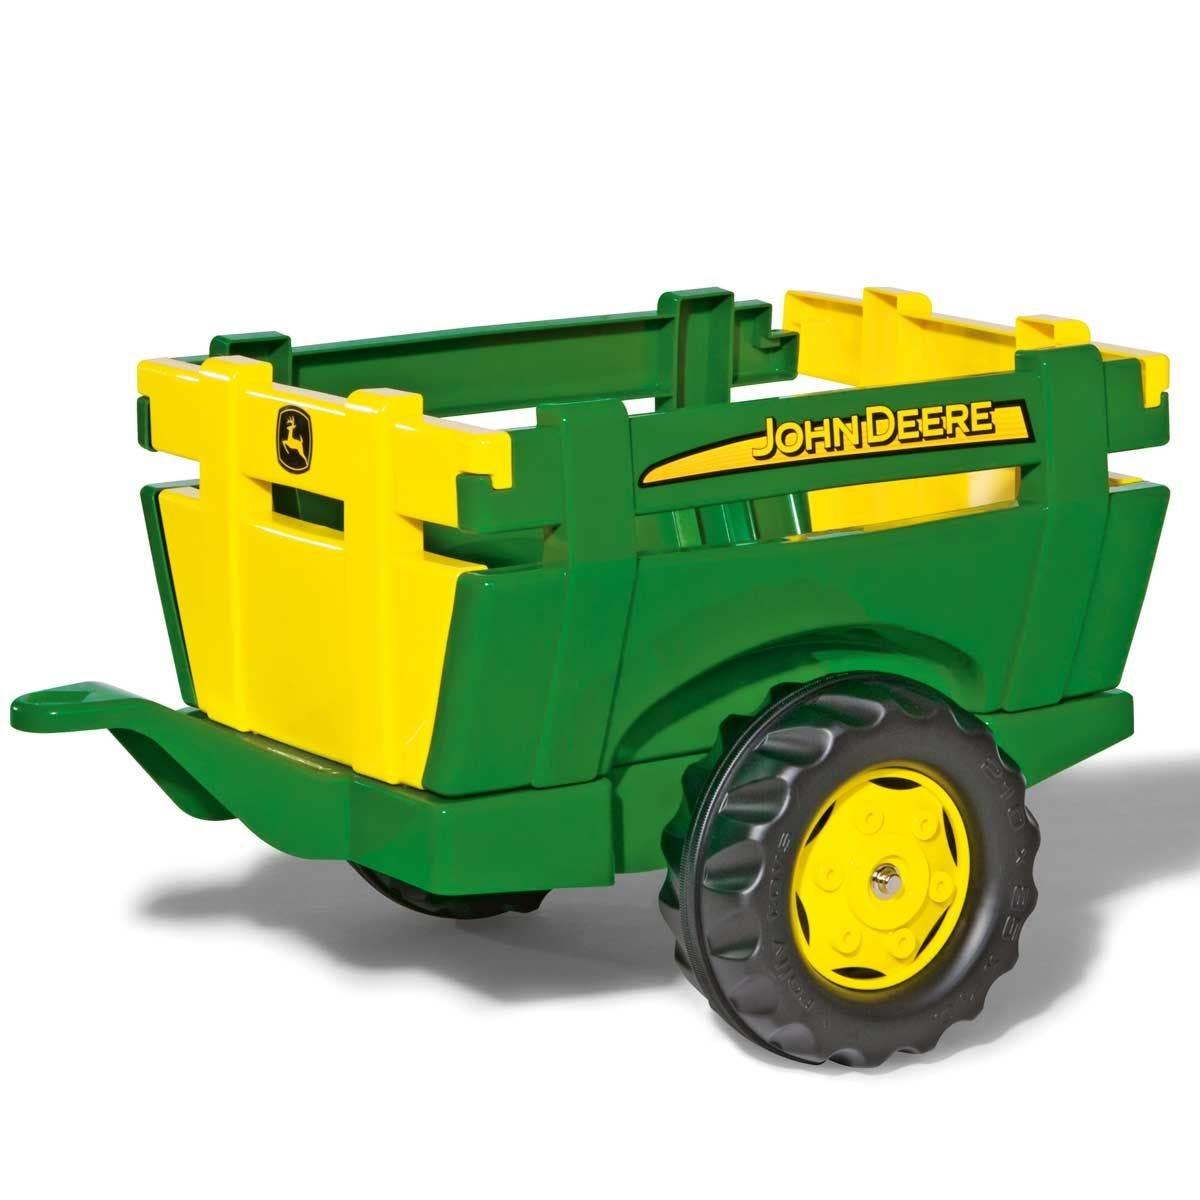 John Deere Farm Trailer for Kid's Ride-On Tractors